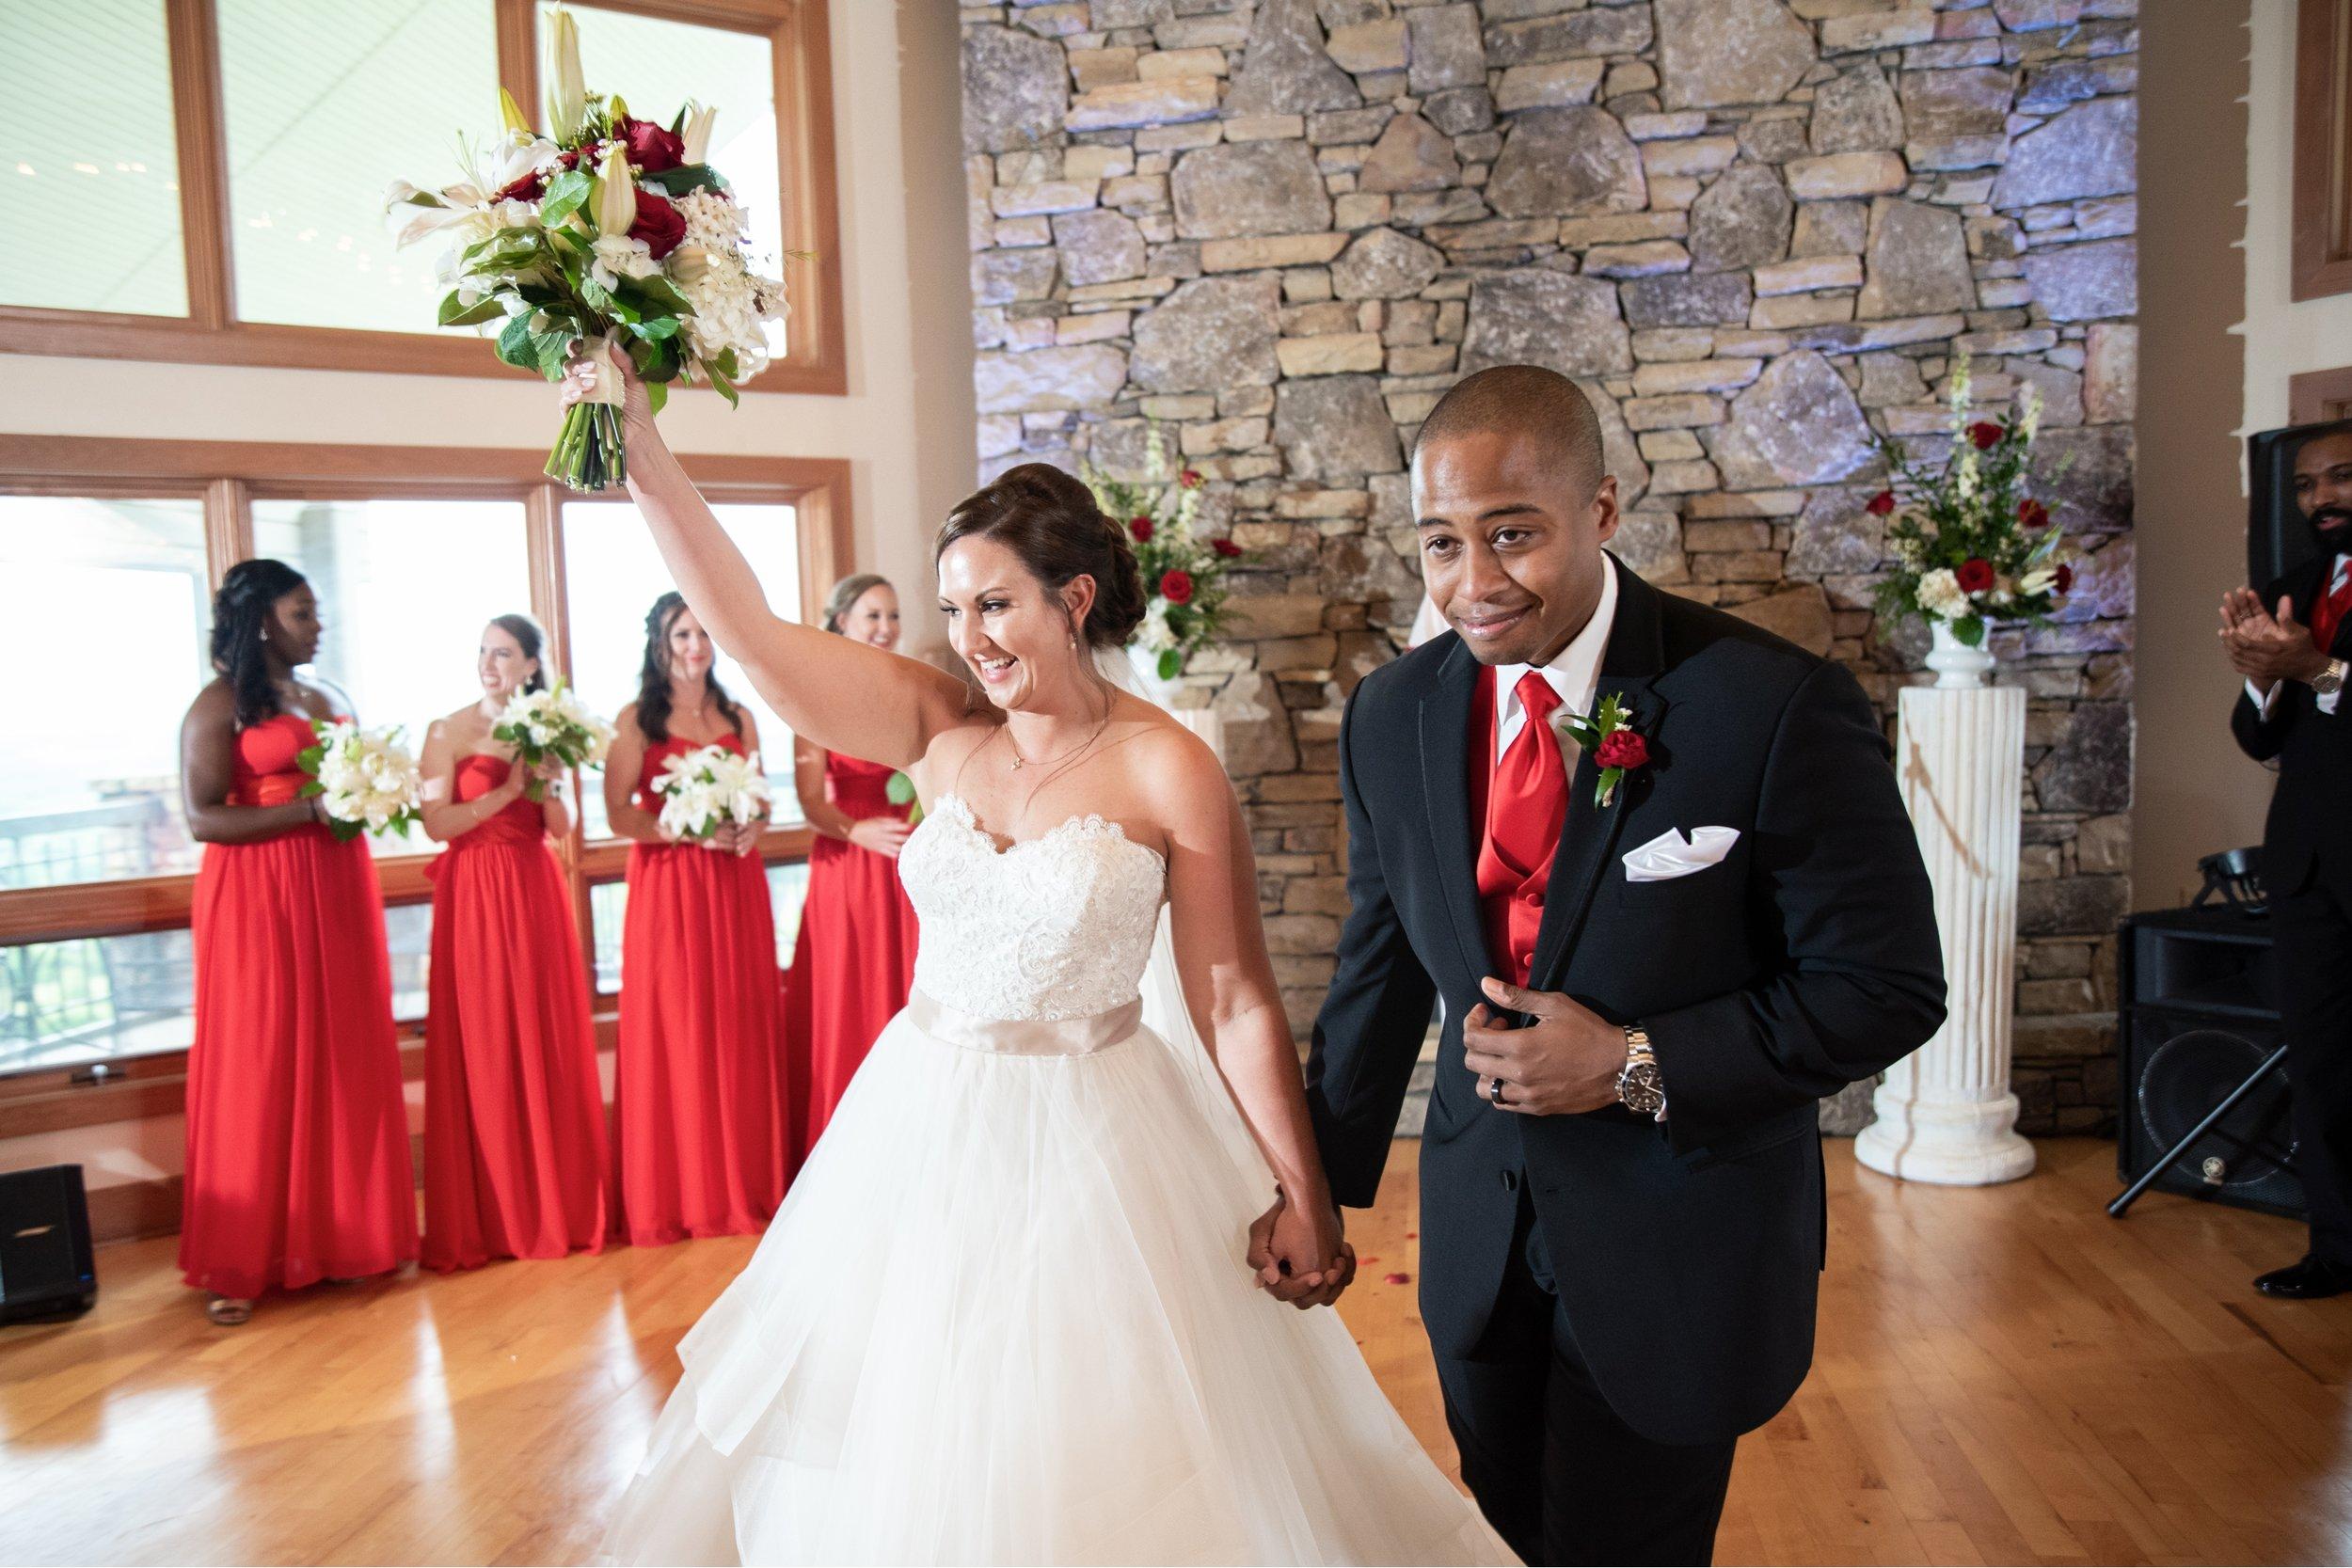 High Vista Weddings - Asheville Wedding 2 22.jpg